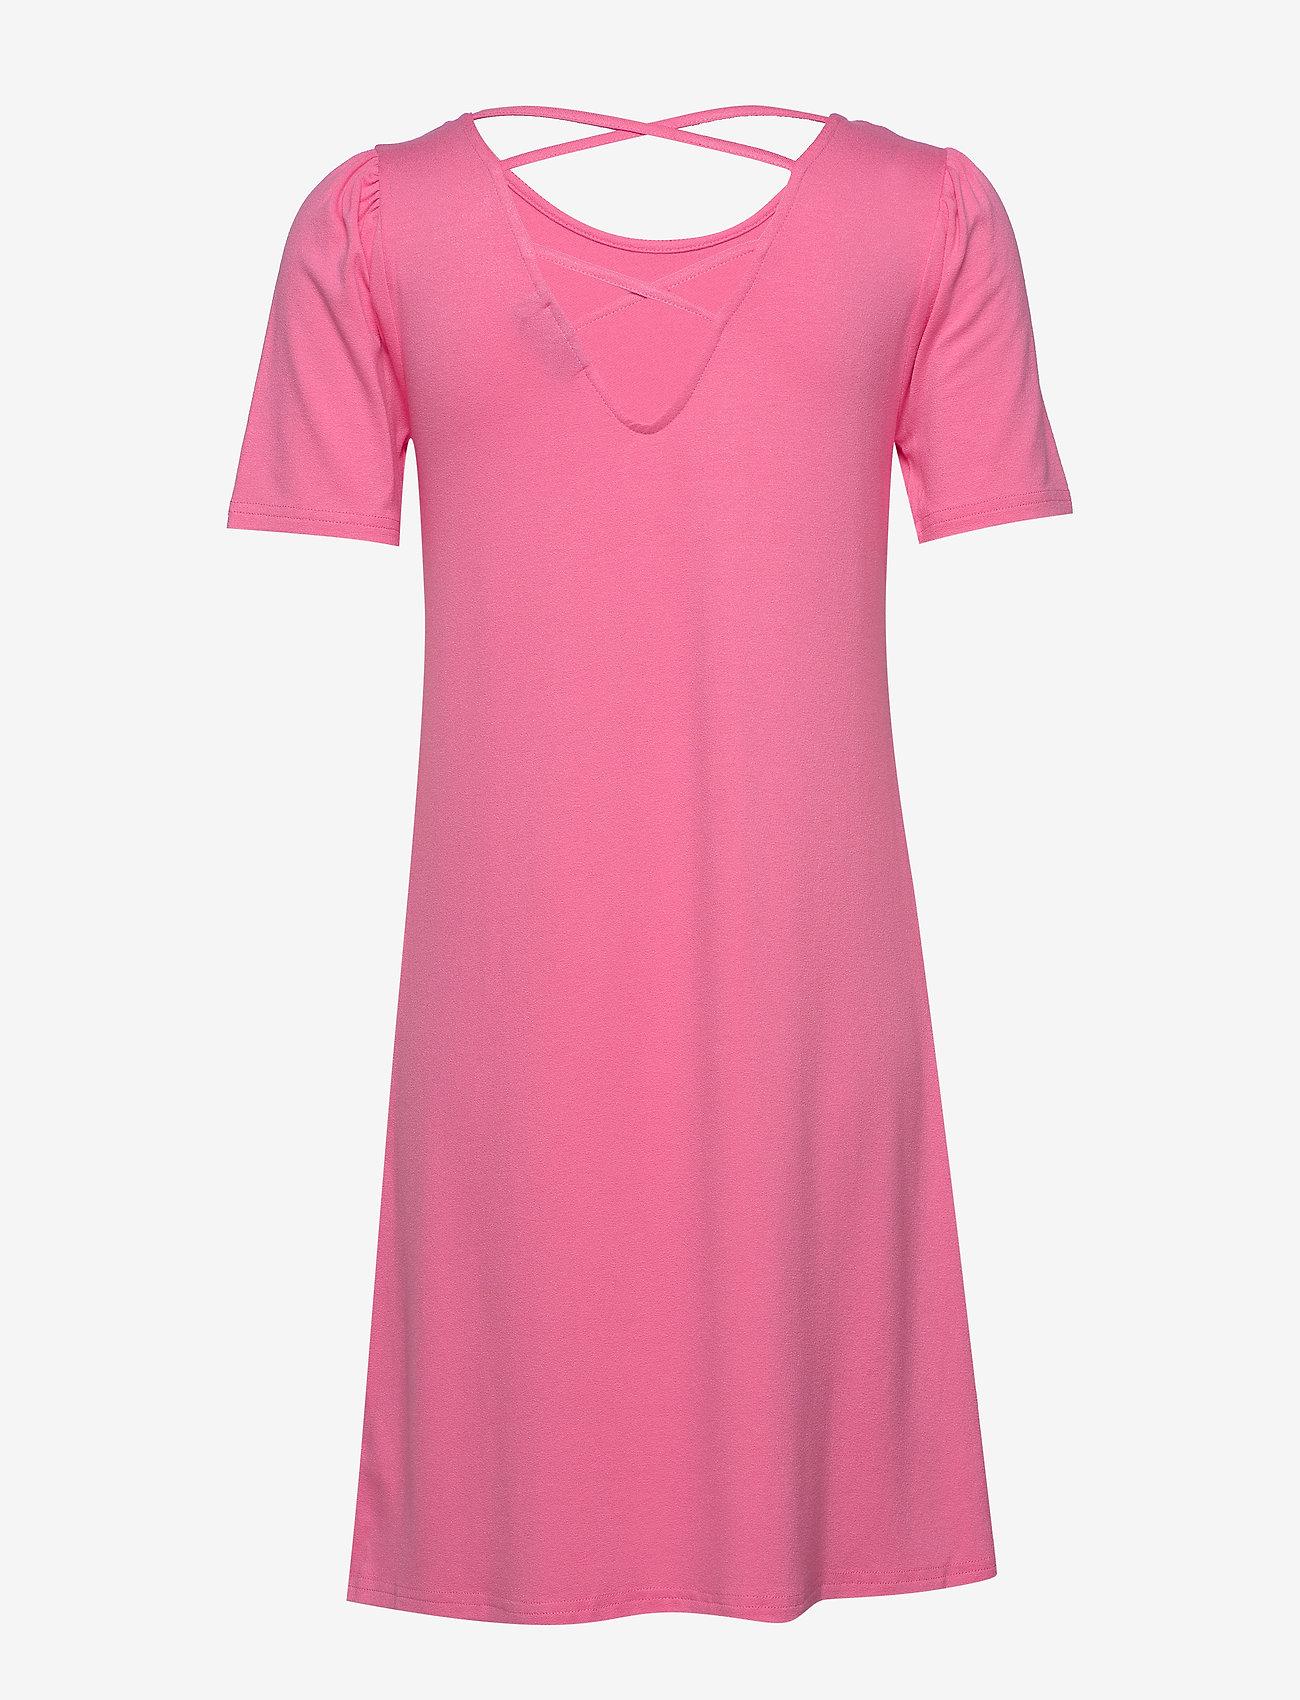 b.young - BYSELIA ADRESS - - korte kjoler - sorbet pink - 1